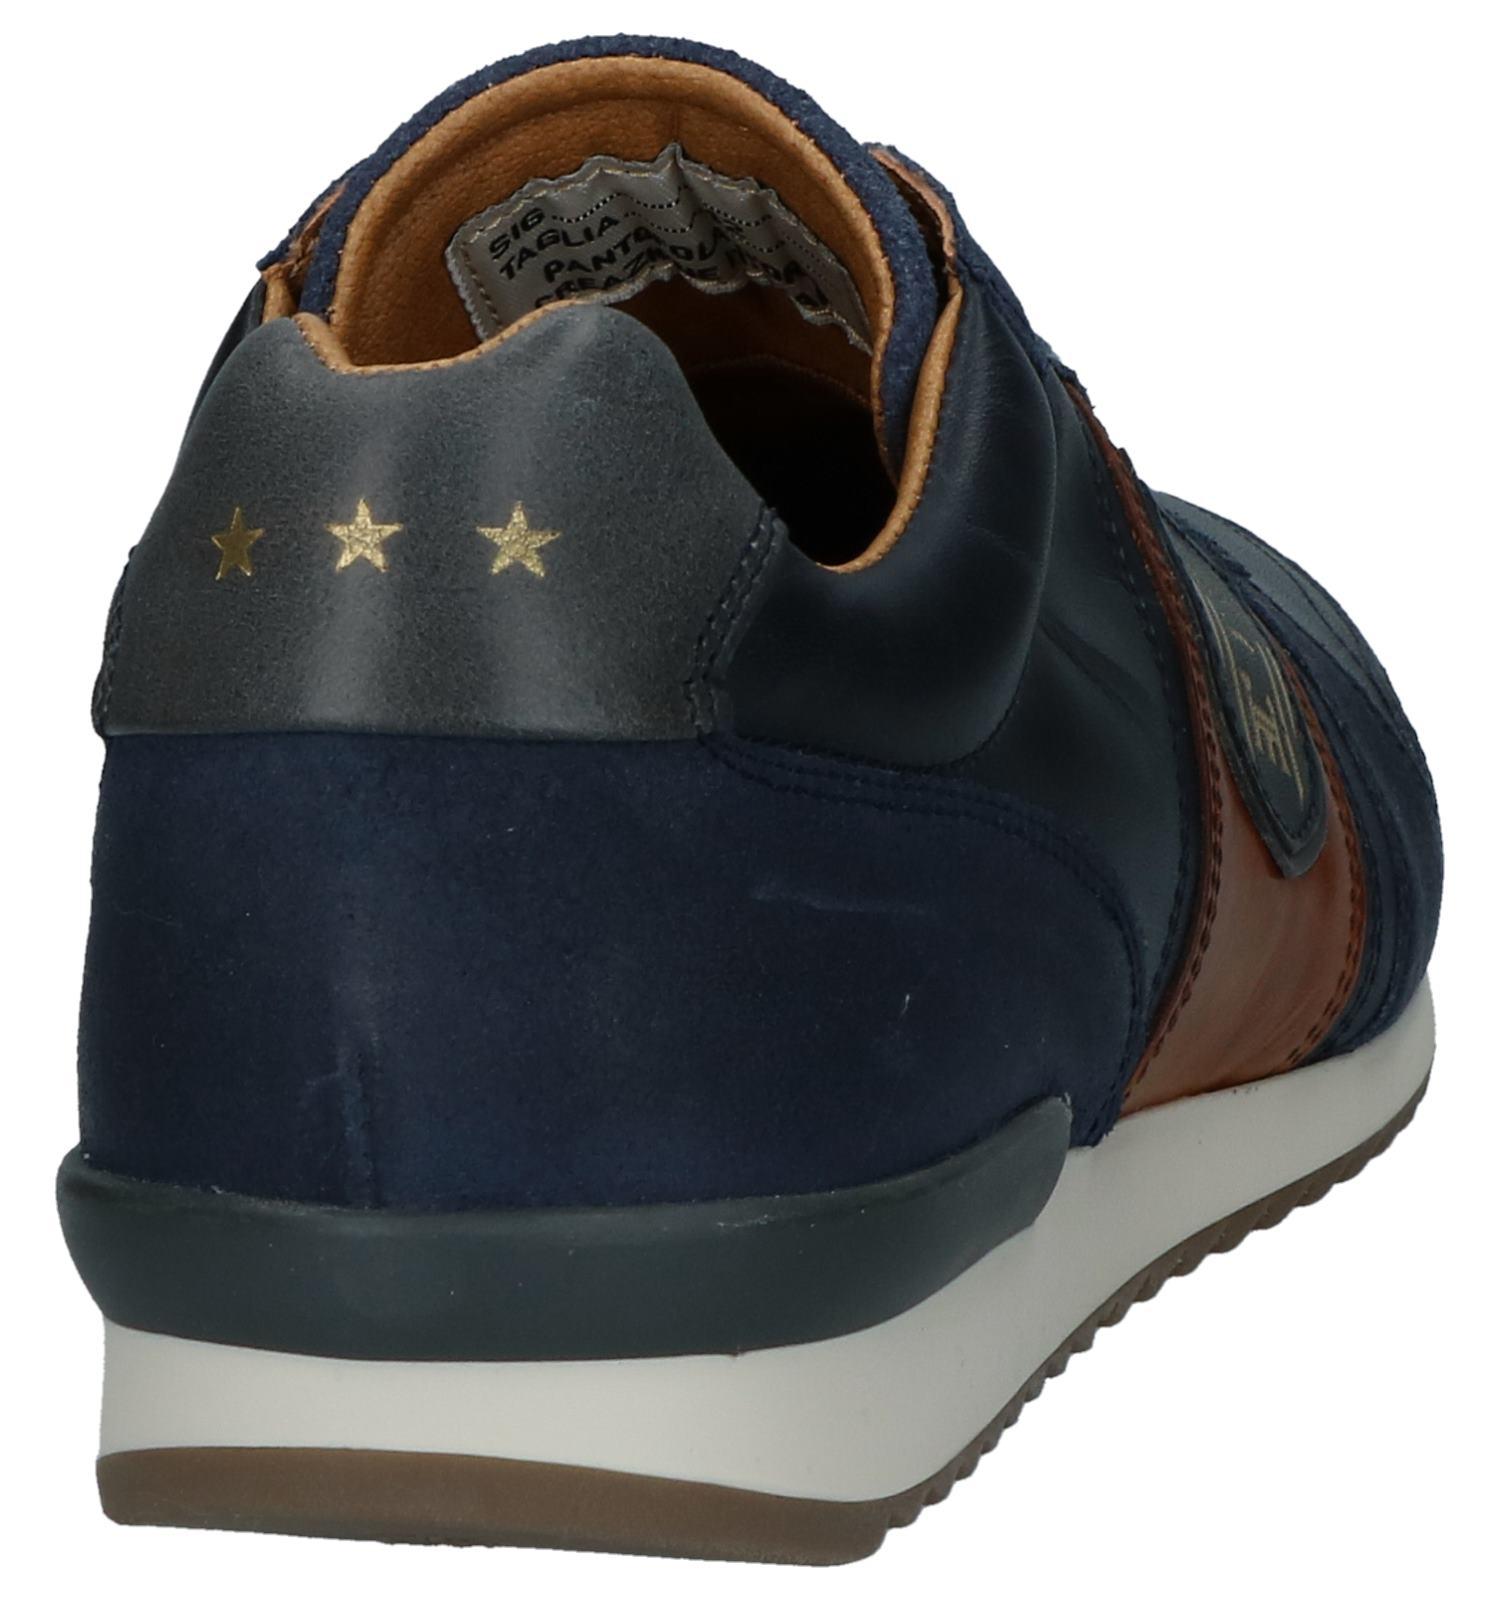 Pantofola Low Donker Veterschoenen Blauwe Casual D'oro Umito K1uJcl3FT